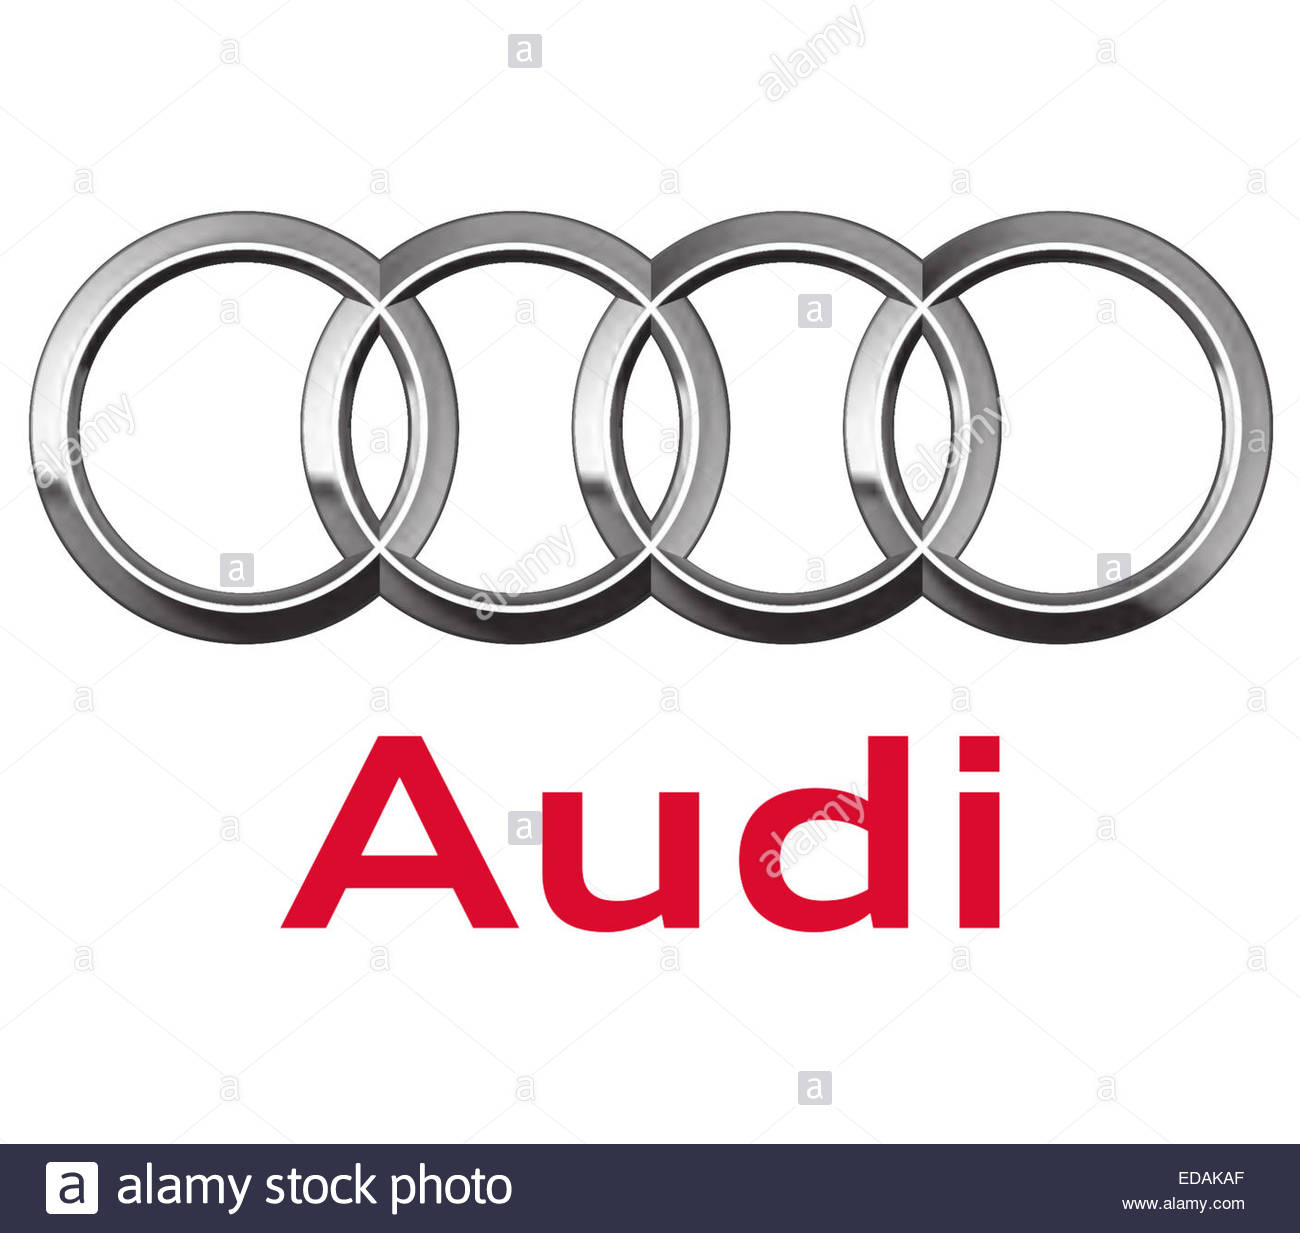 Audi logo icon sign Stock Photo: 77066711 - Alamy